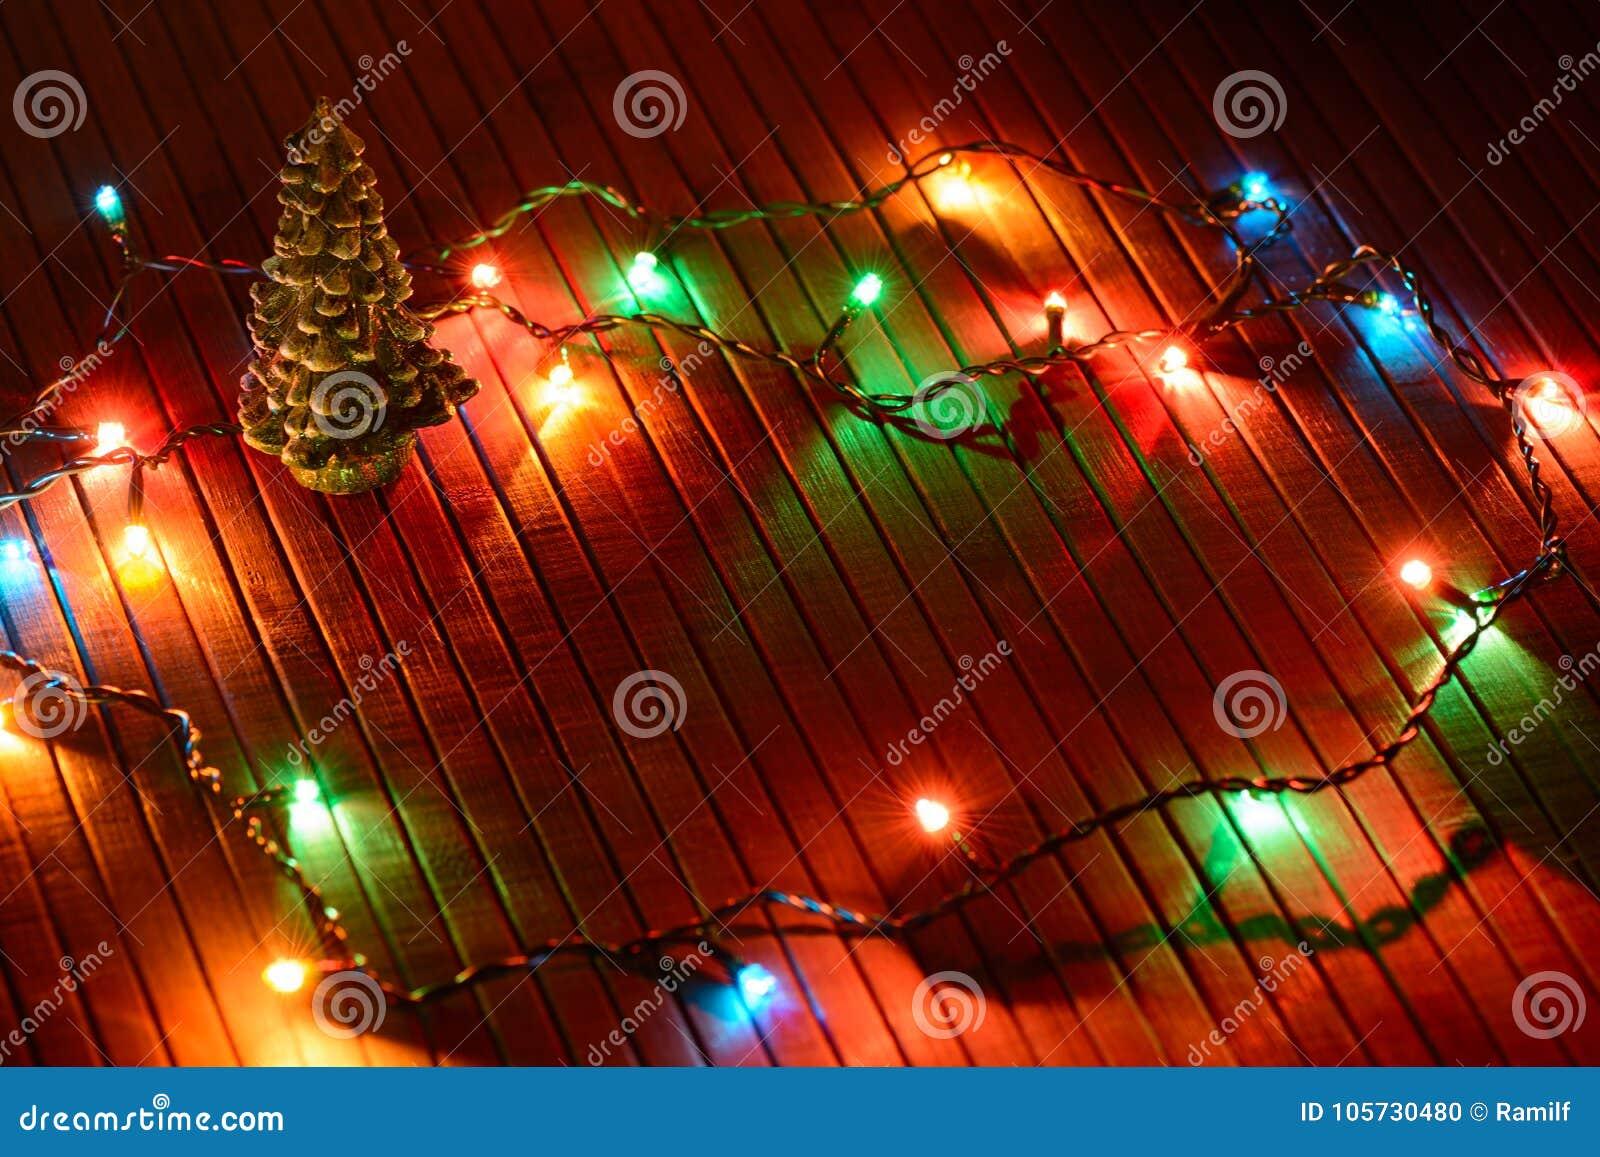 Christmas decor miniature Xmas tree and glowing lights